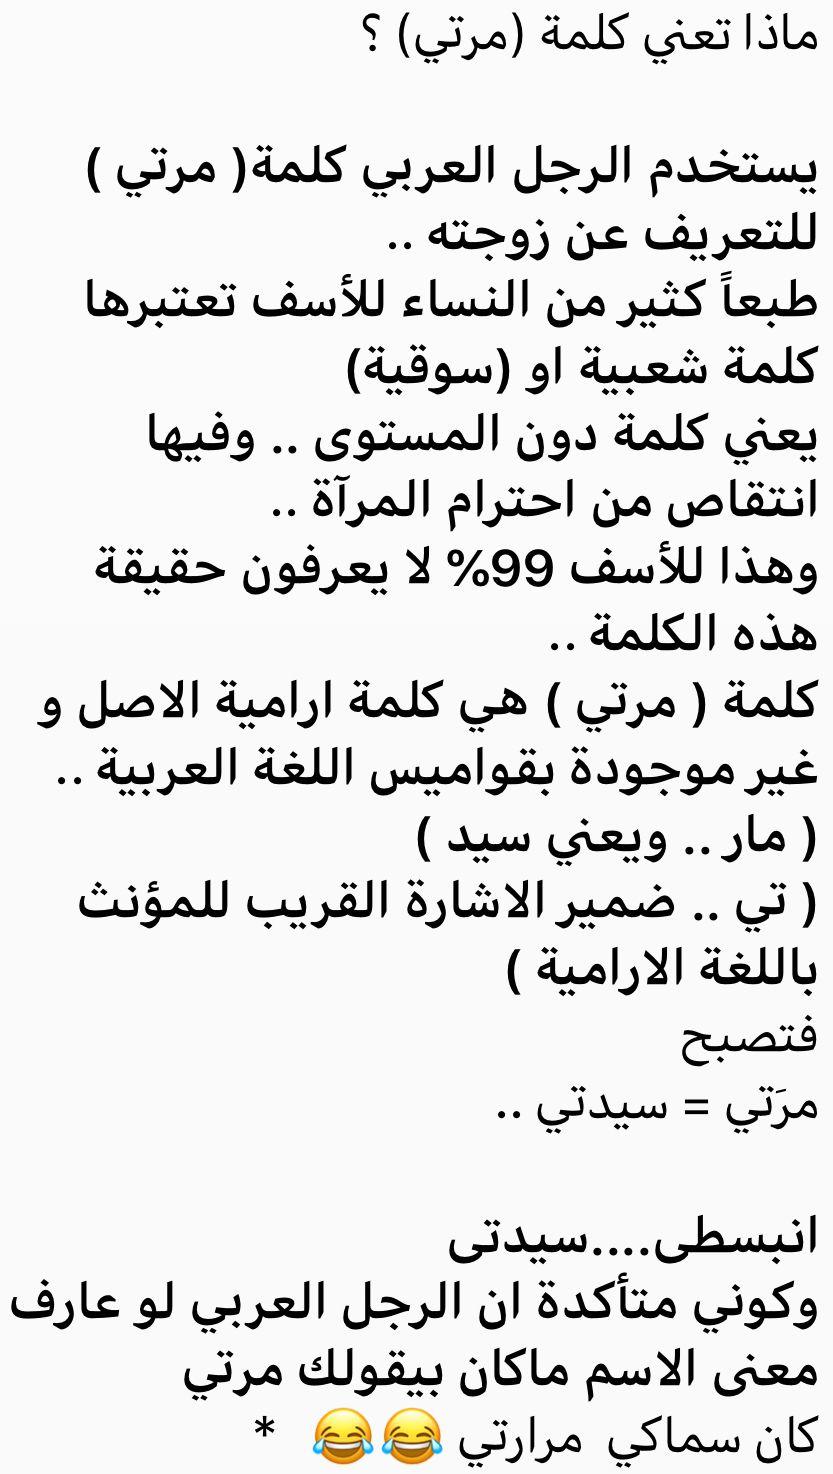 Pin By صورة و كلمة On ابتسامة ᴗ Funny Arabic Funny Jokes Arabic Jokes